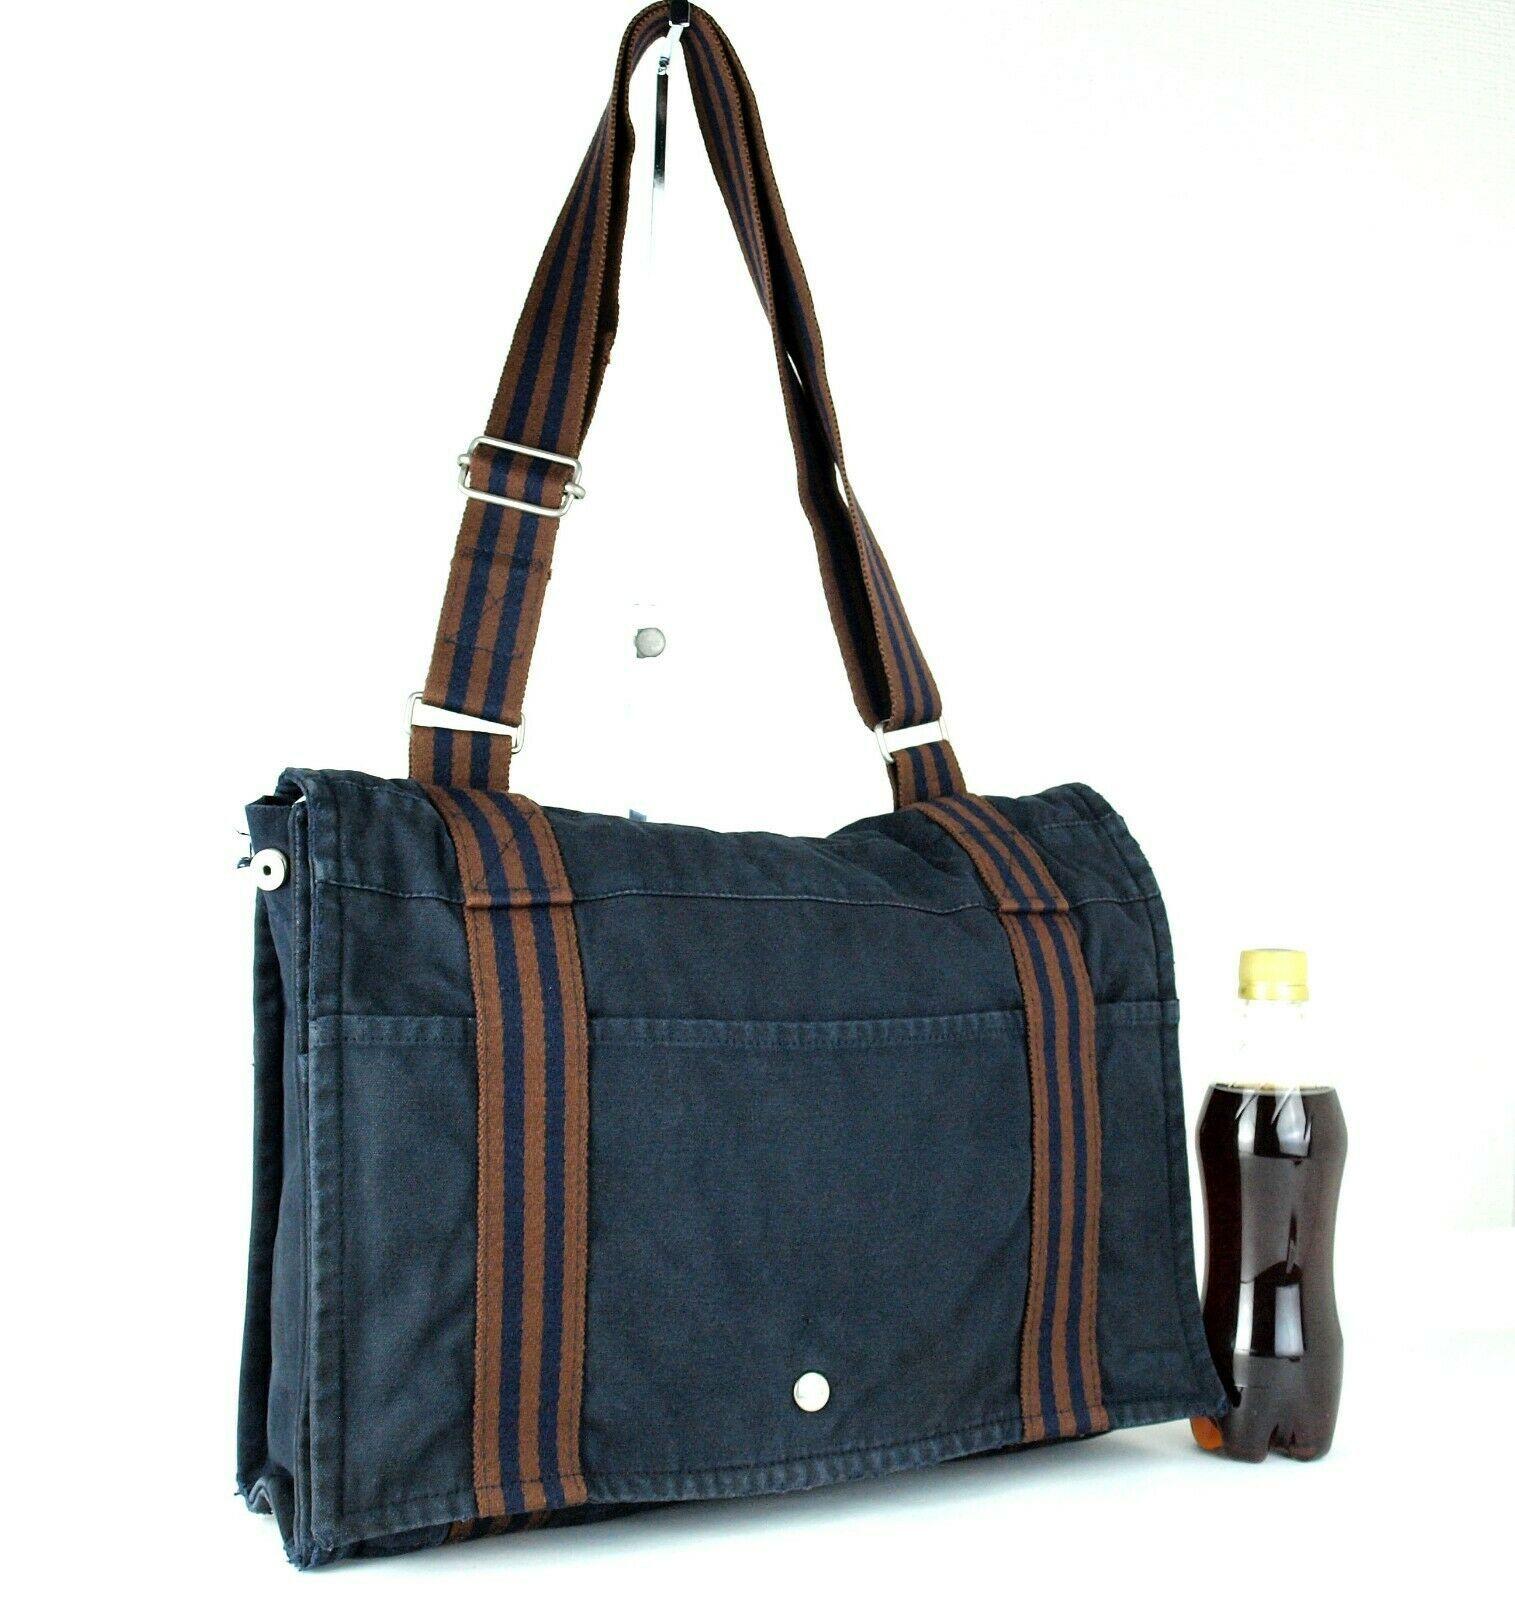 Auth Hermes Fool Toe Vassus MM Navy Cotton Canvas Shoulder Bag Purse France Used